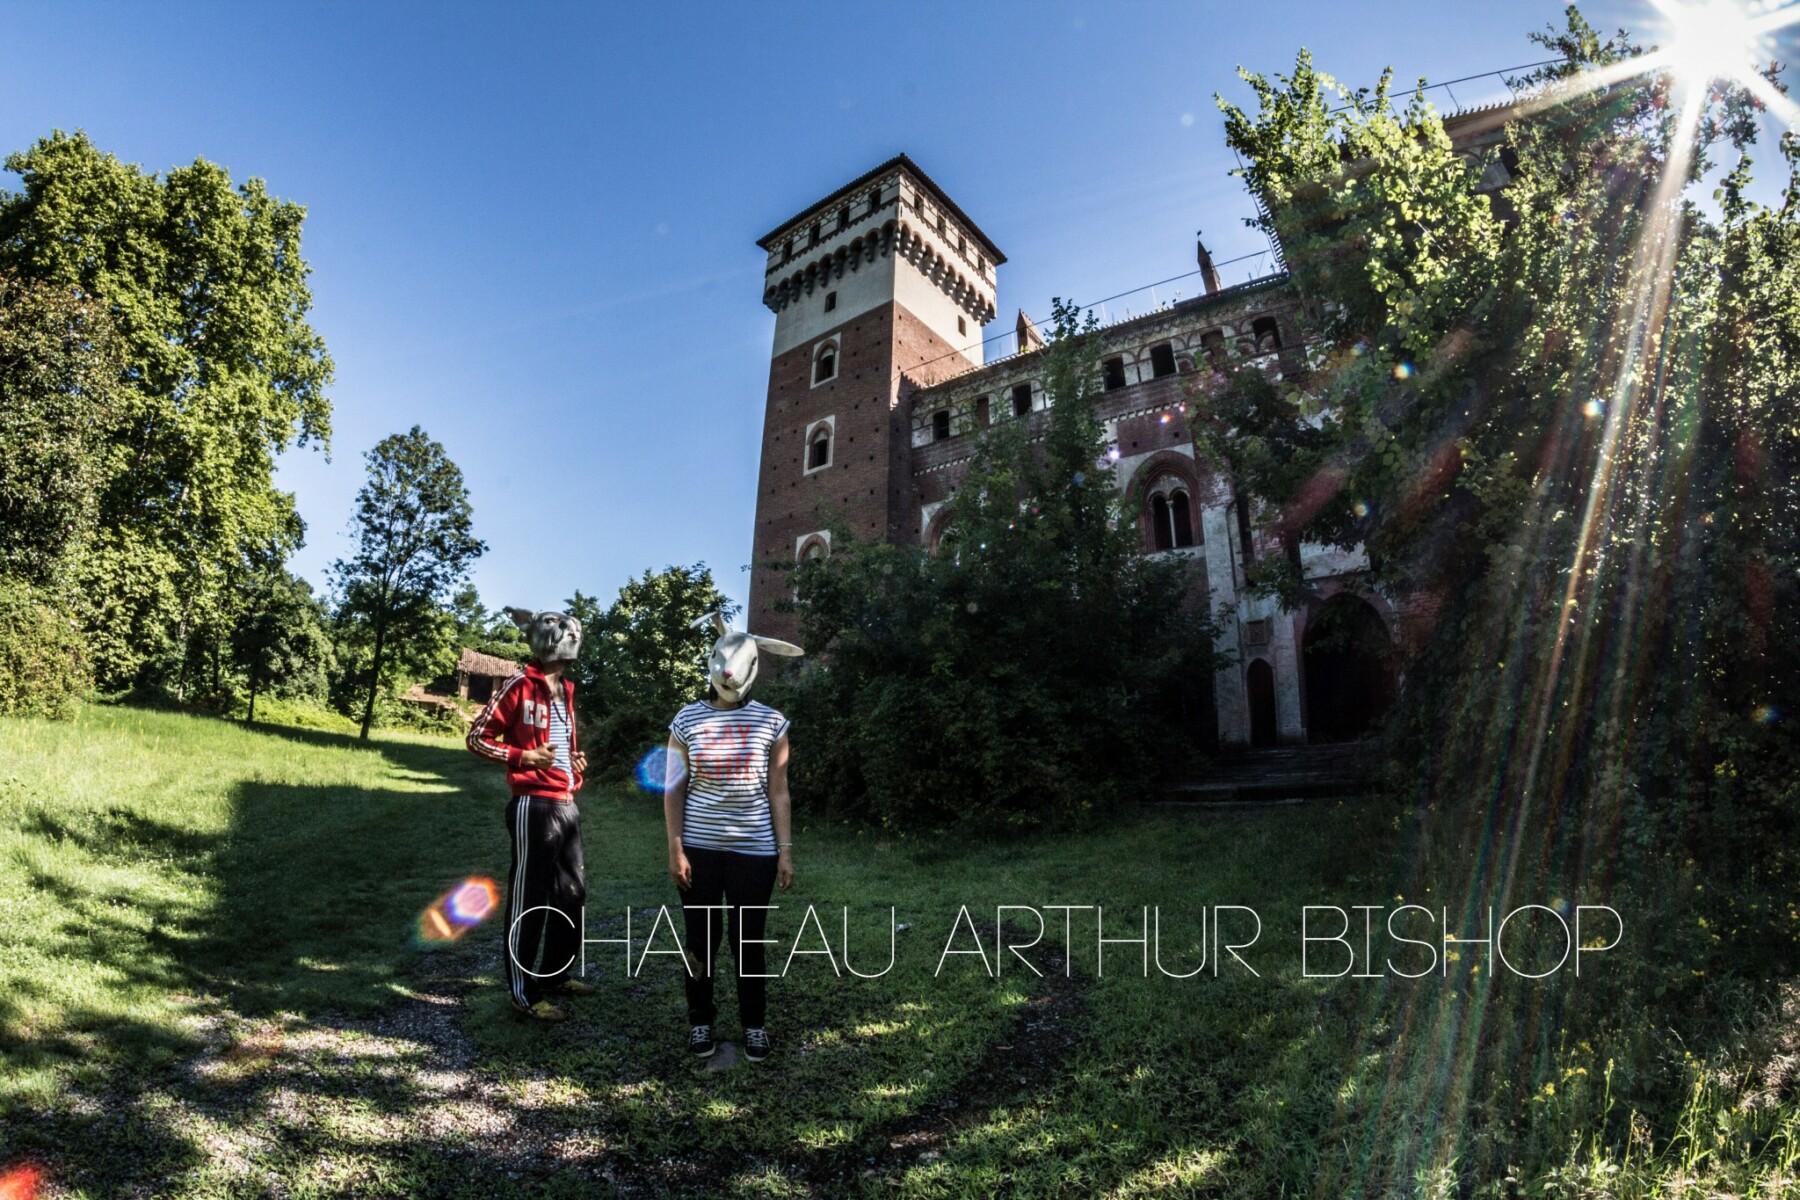 Château Arthur Bishop